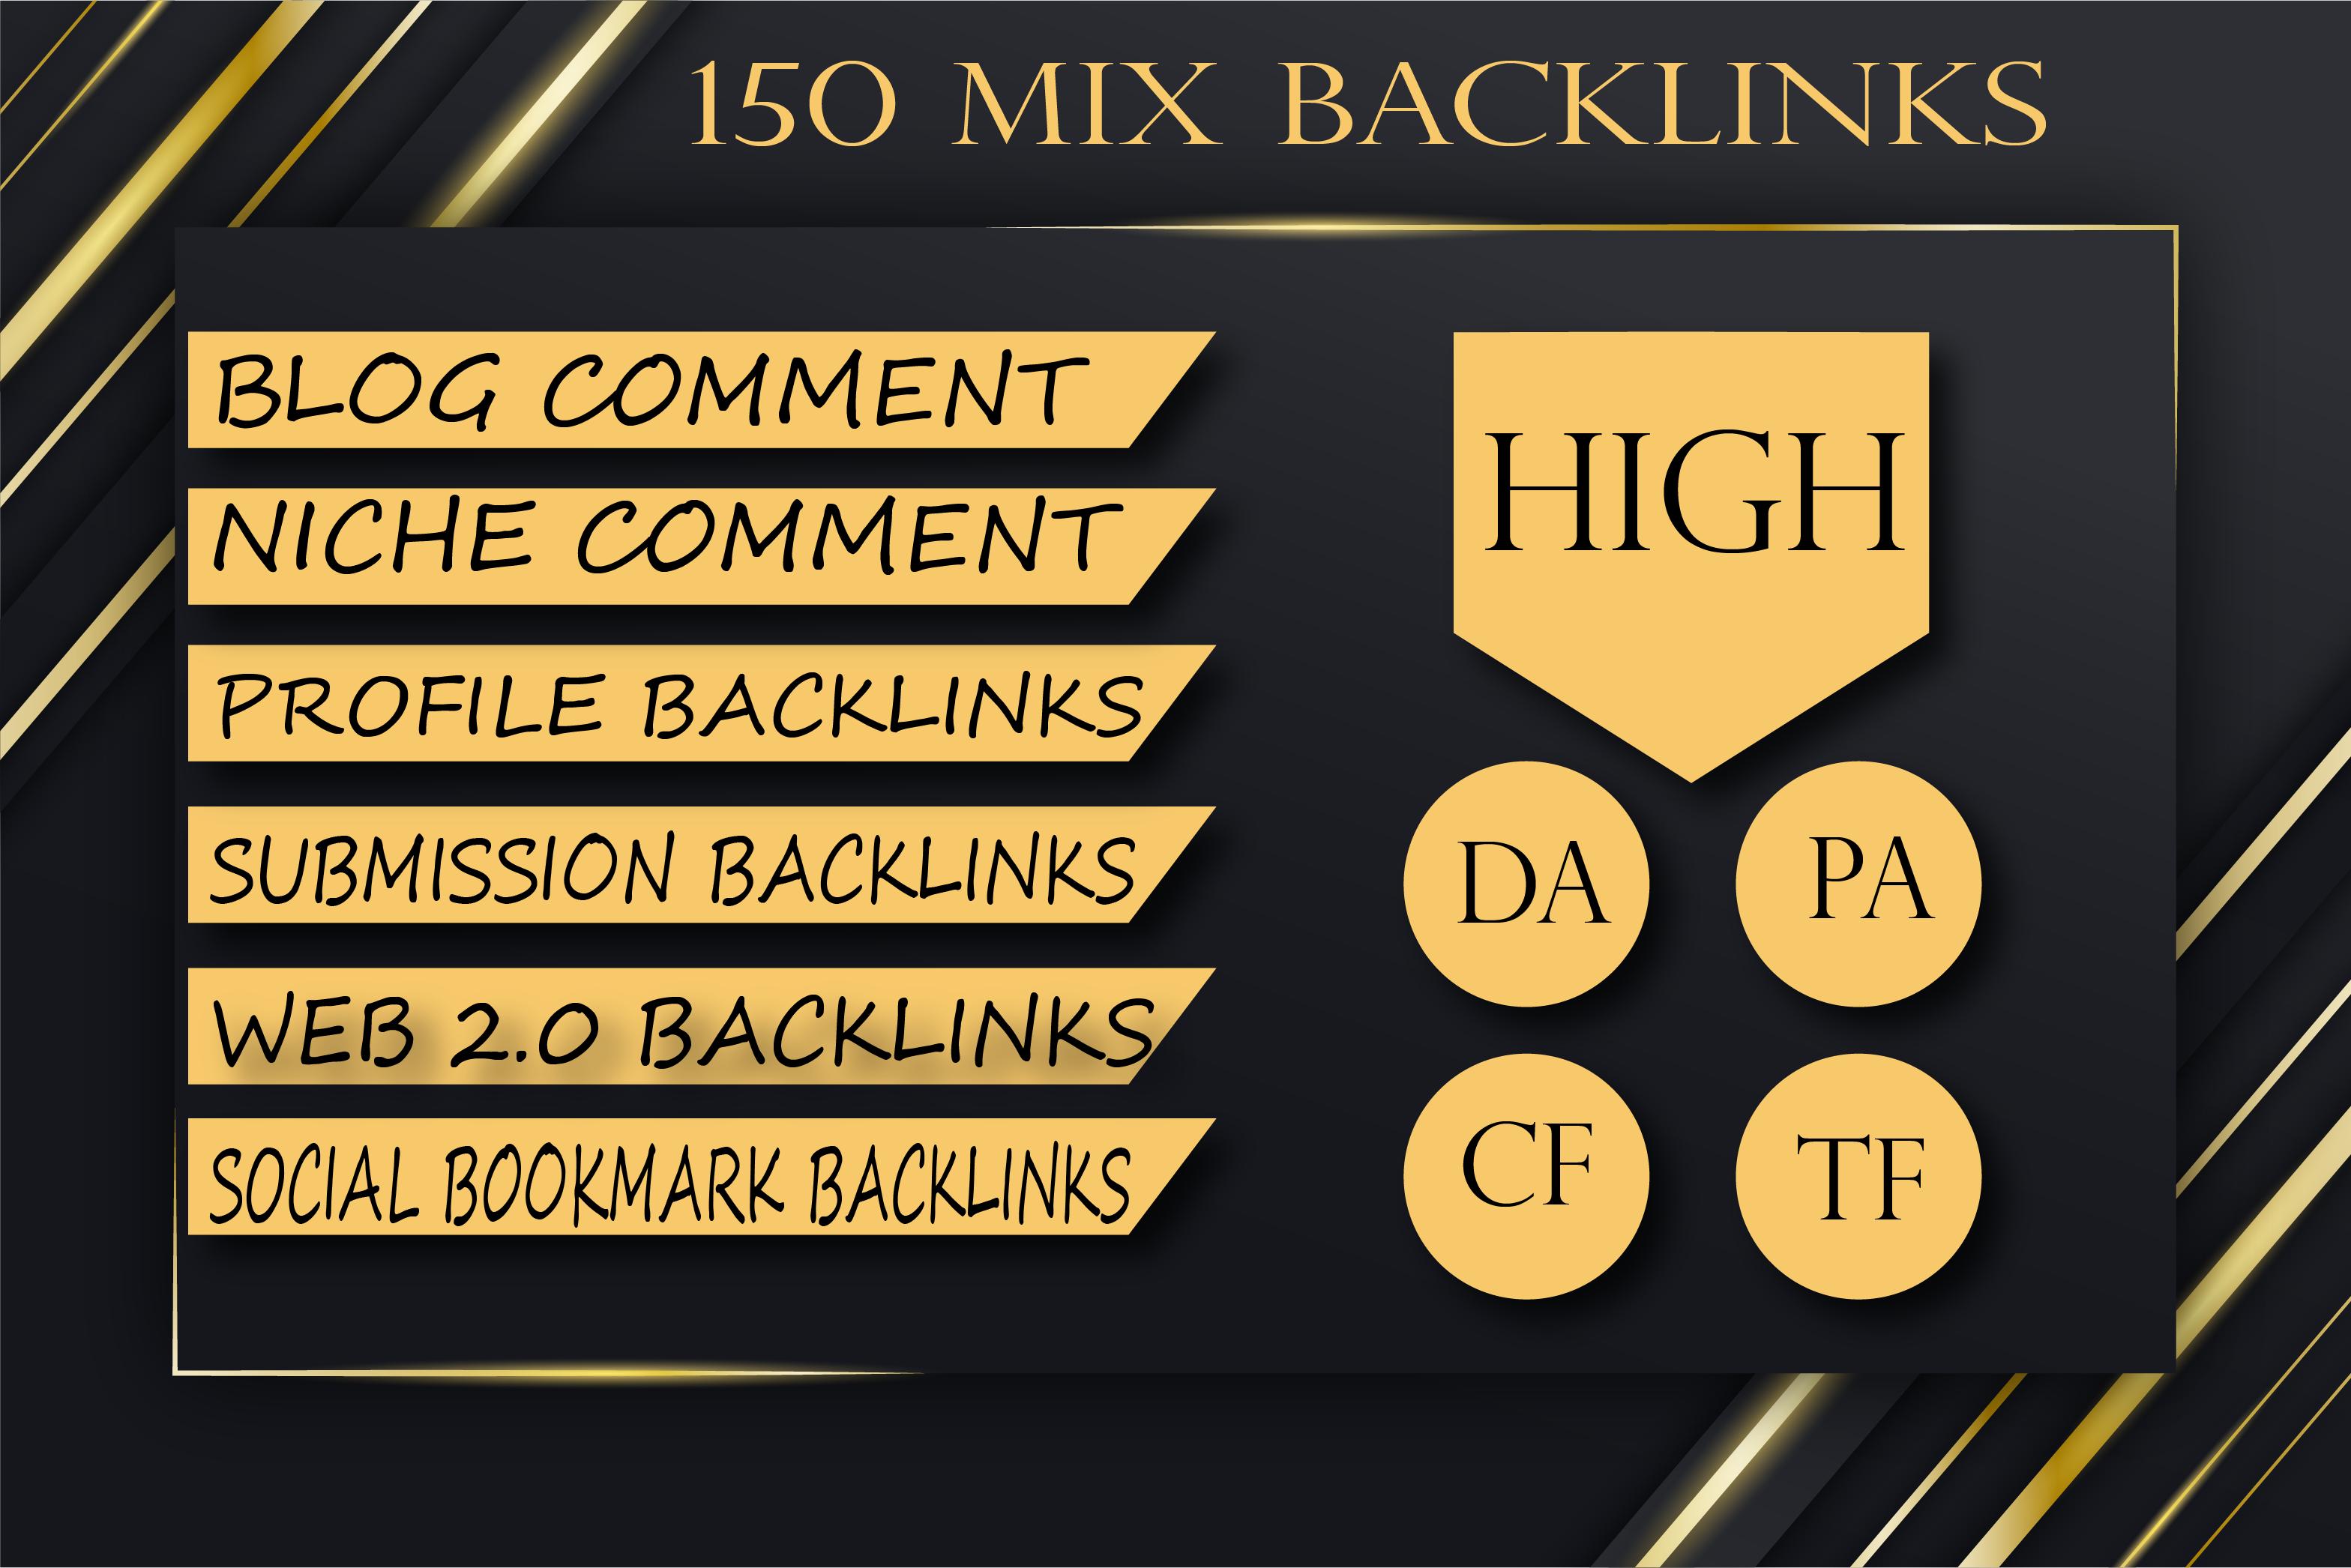 Build 150 MIX backlinks manual link building service for google top ranking